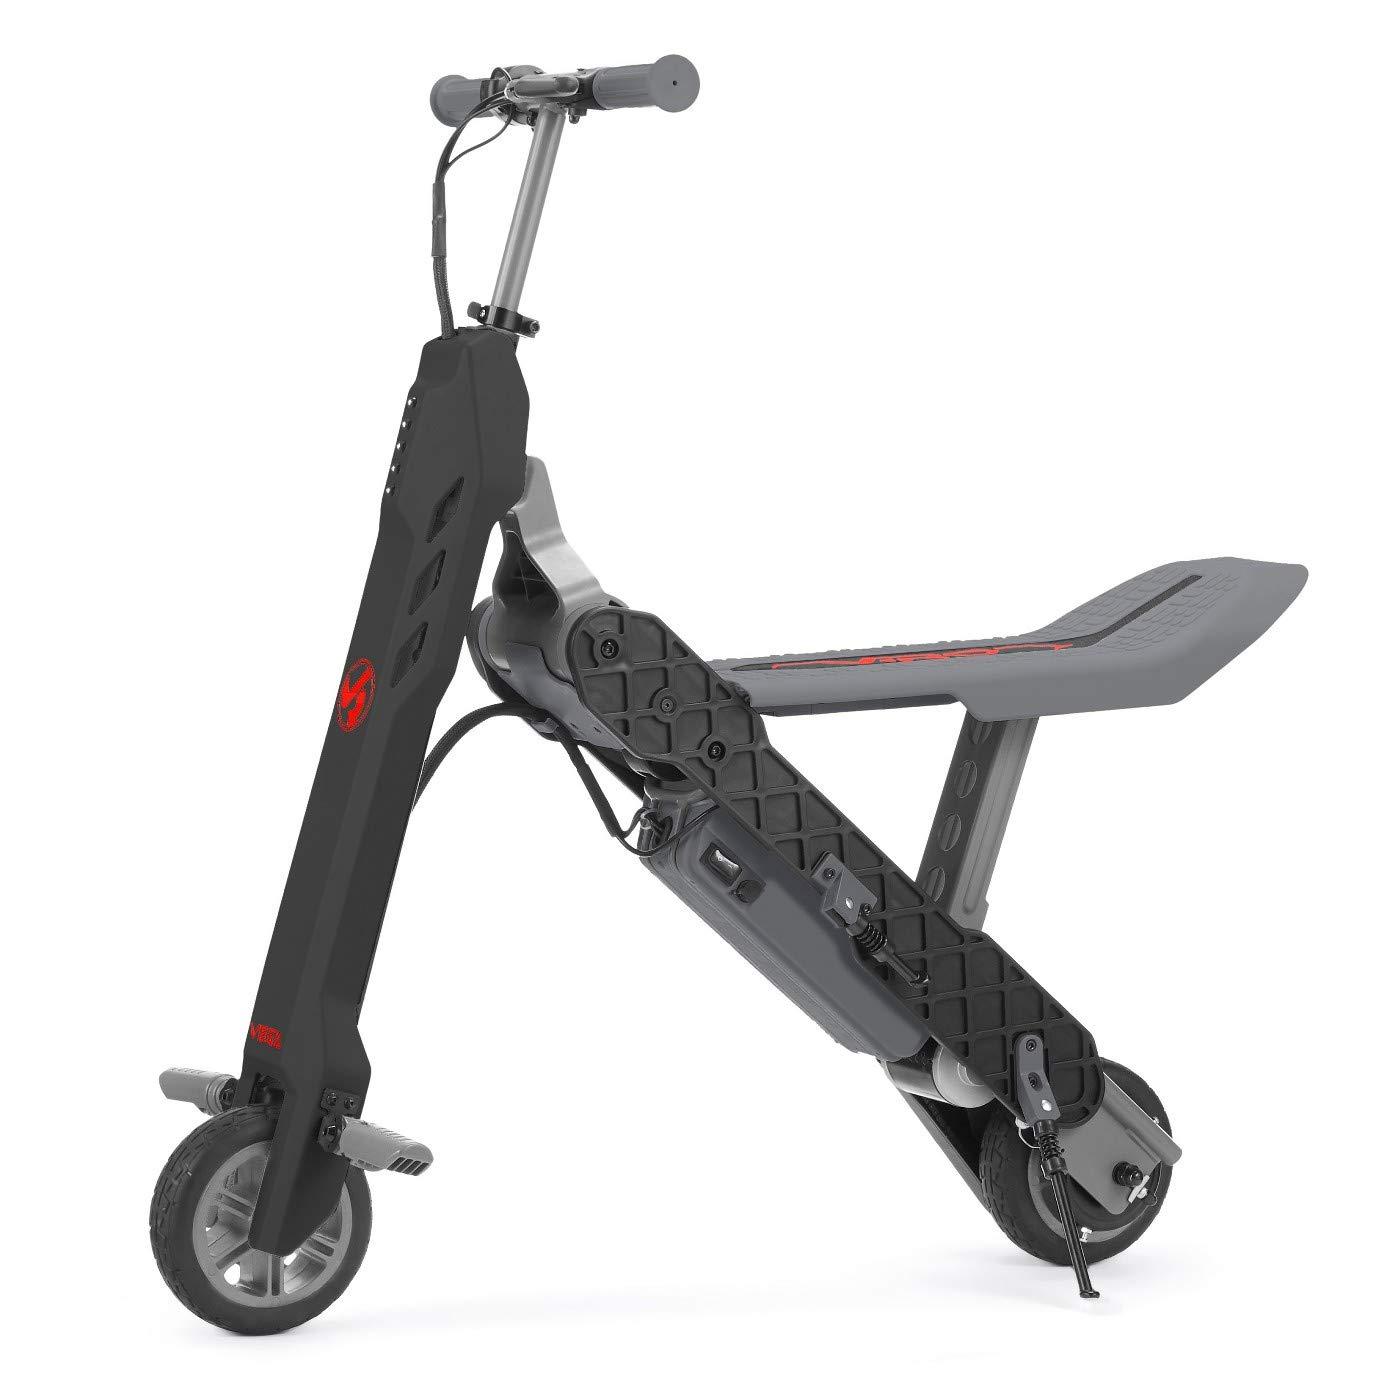 Amazon.com: LTXTREME VIRO Rides Vega 2-n-1 - Patinete ...